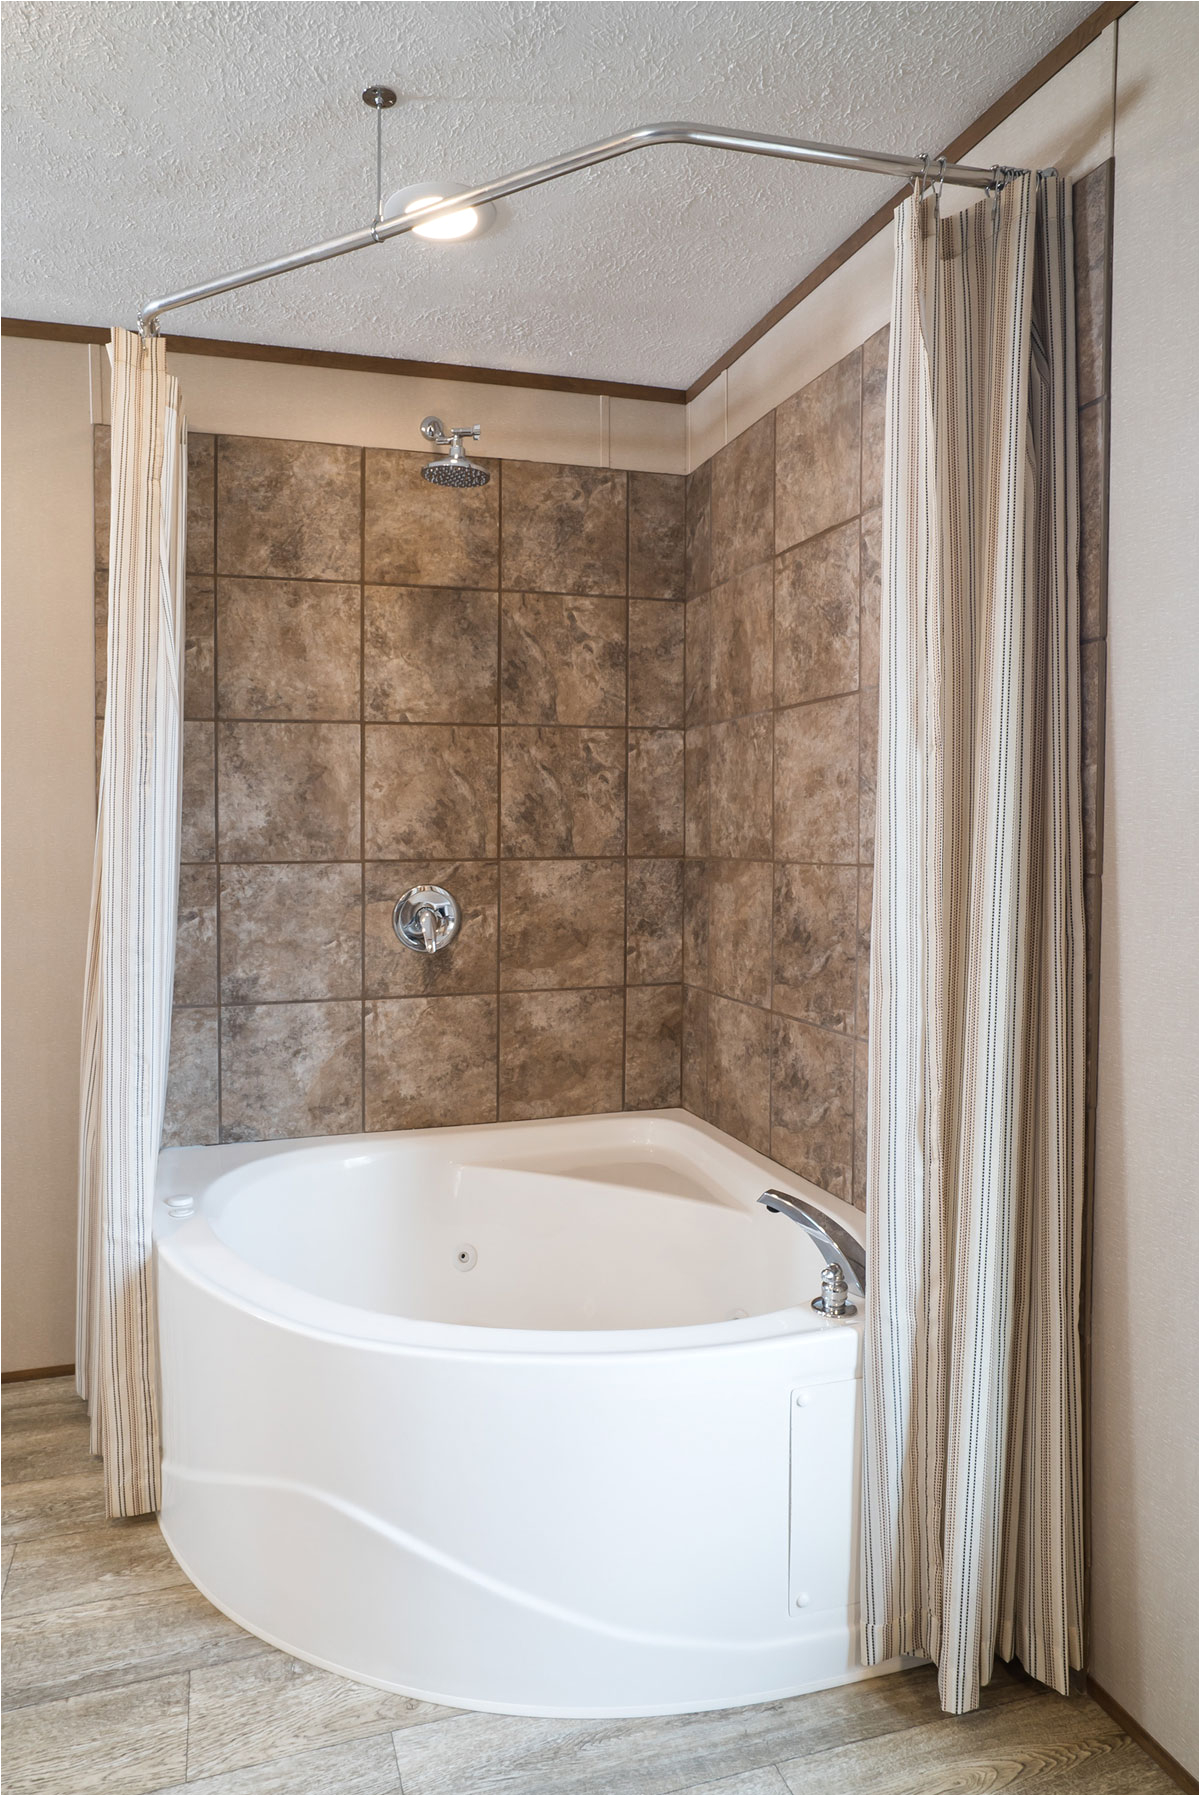 "54 Inch Corner Bathtub 2223 Bay Springs 54"" Corner Tub with Skirt Baymont Bathware"